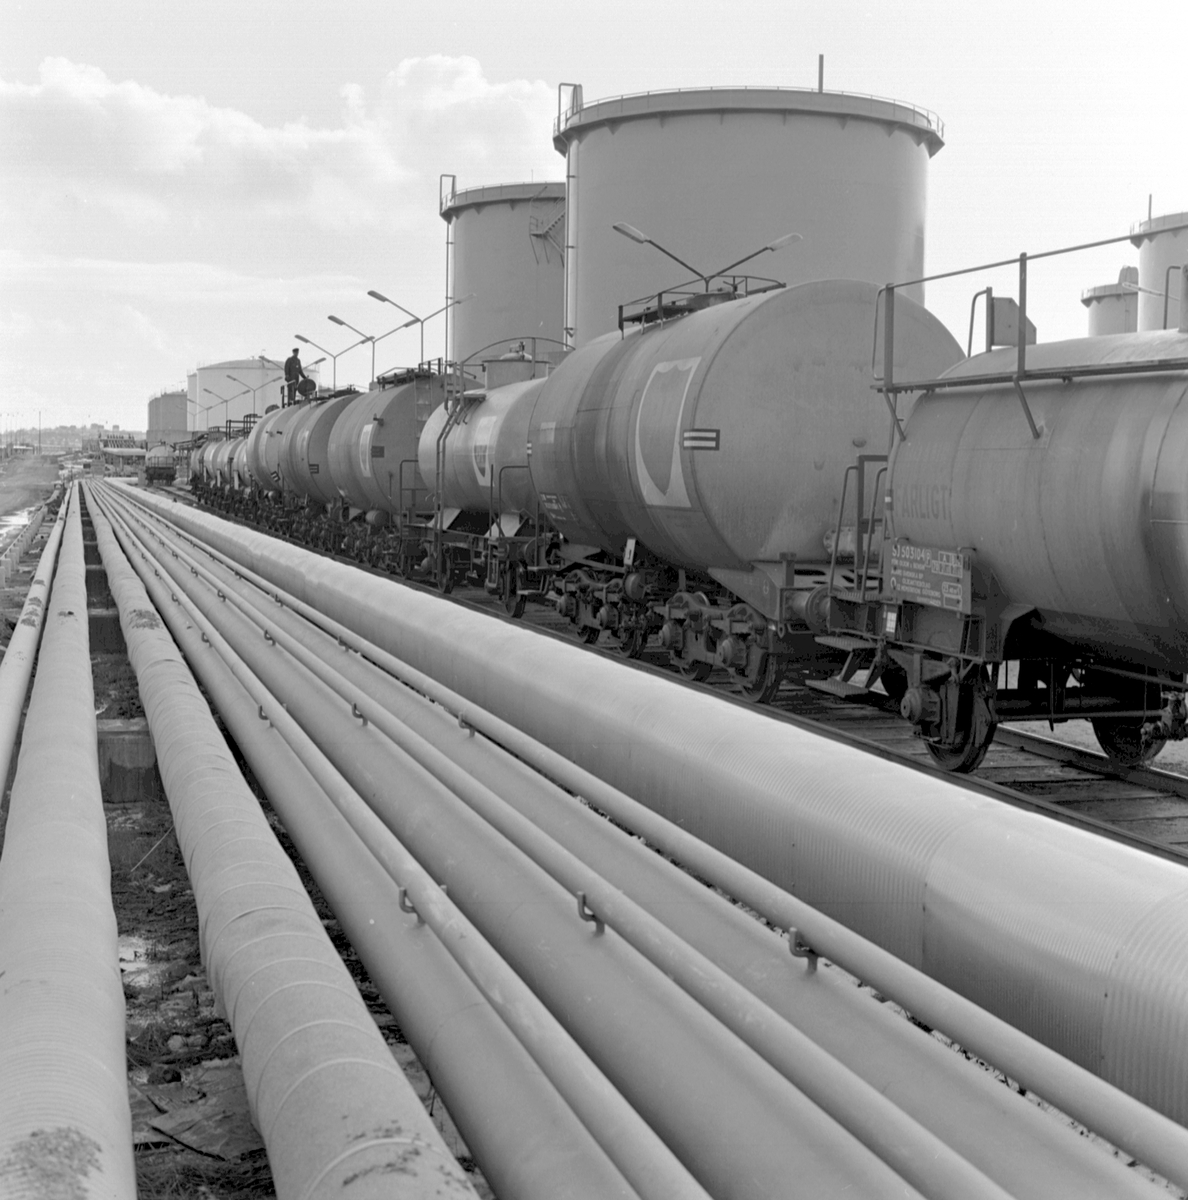 Oljetransporter, BP. Oljeledningar